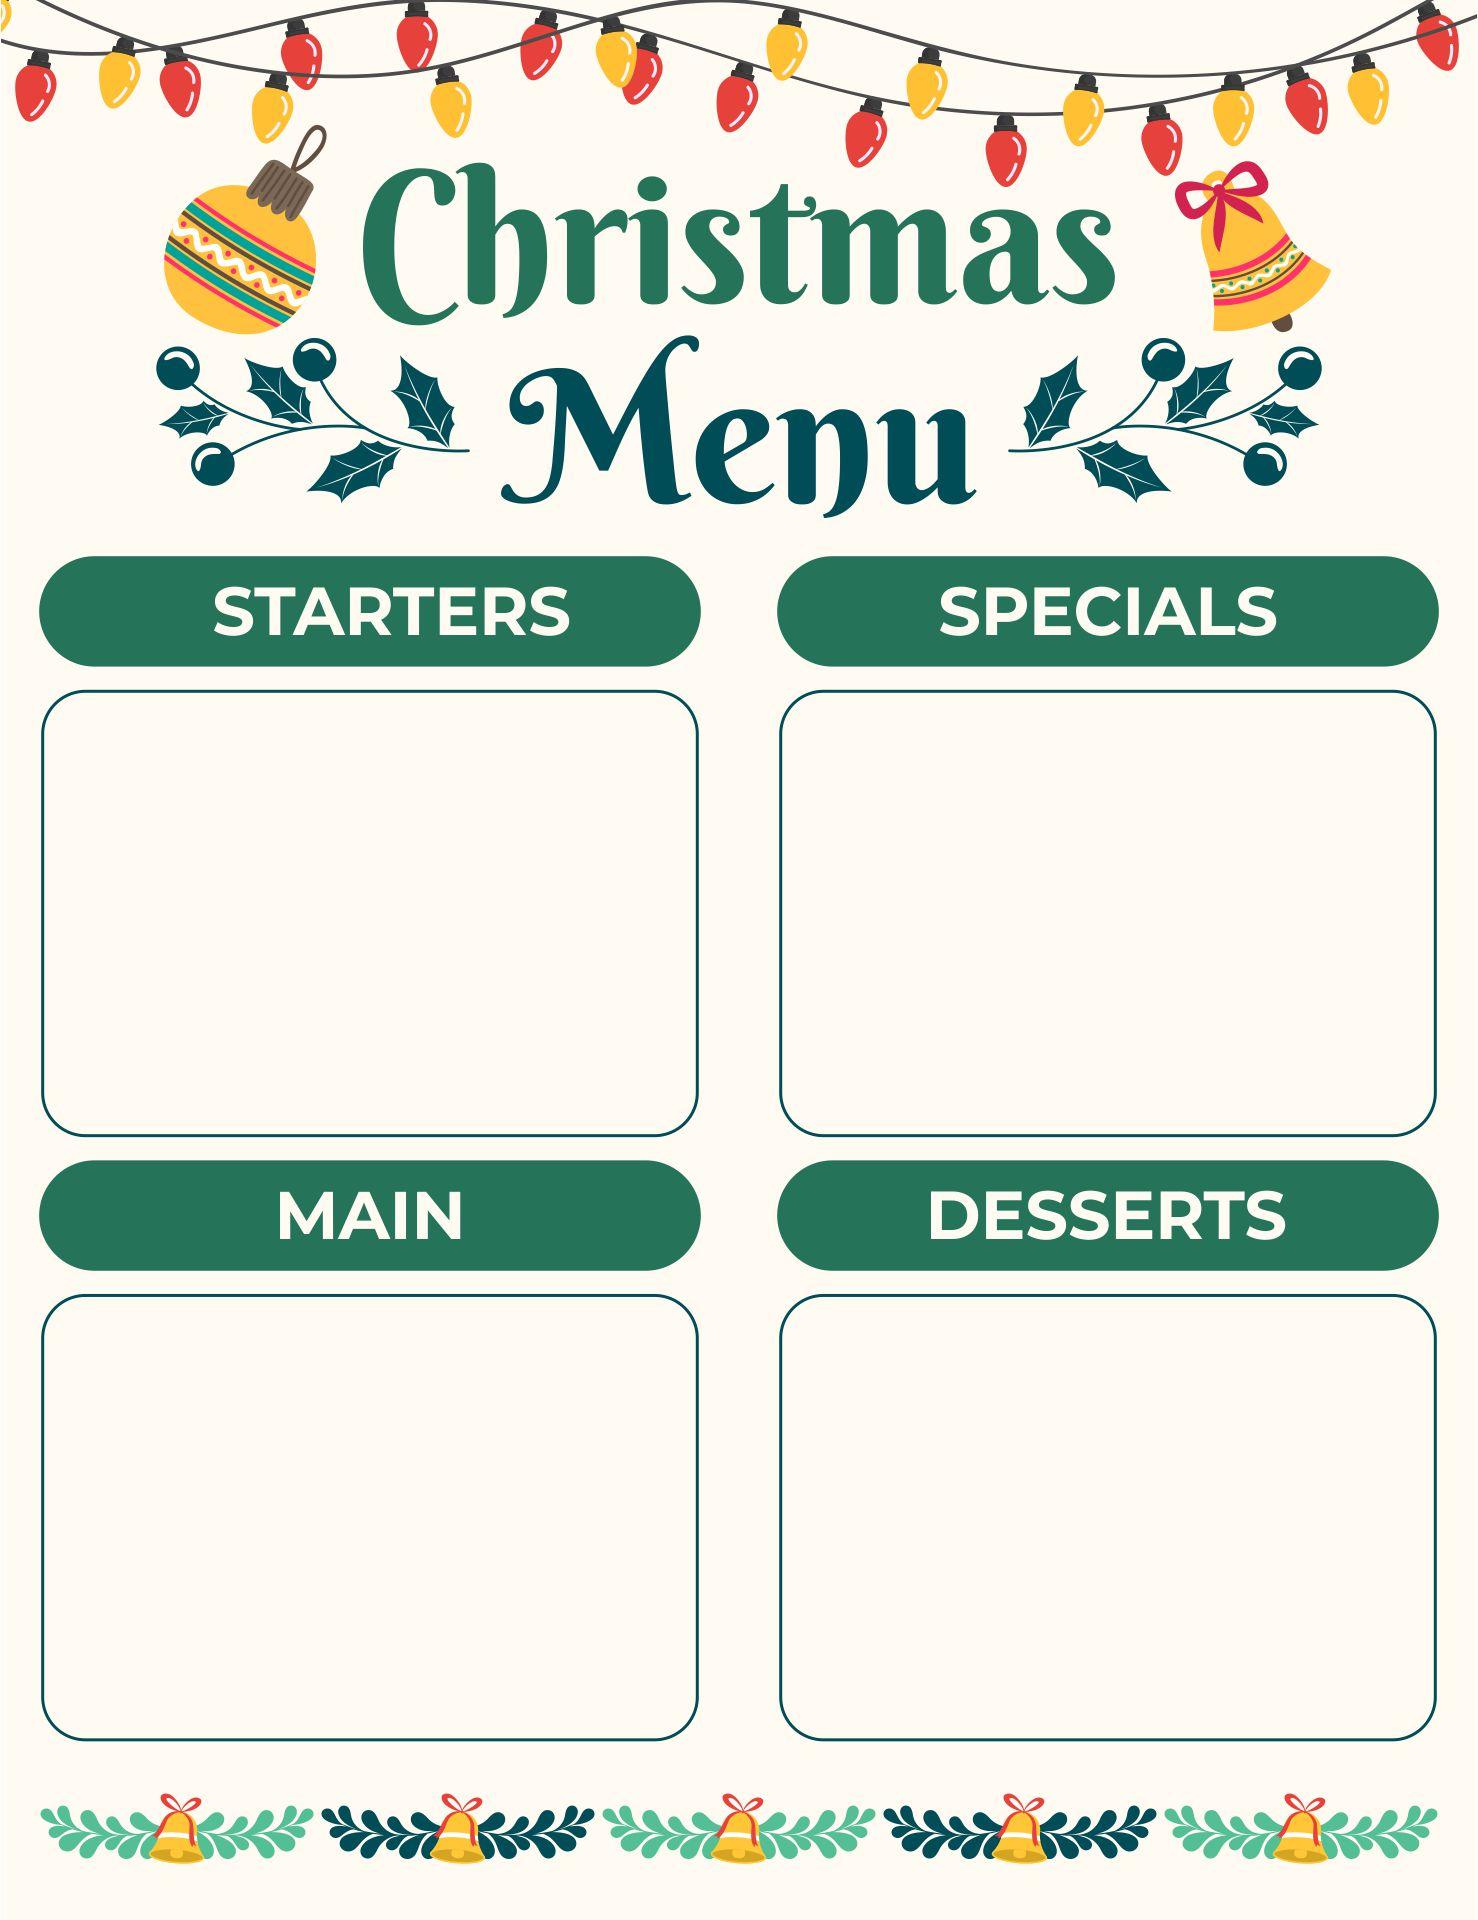 5 Images of Christmas Dinner Menu Printable